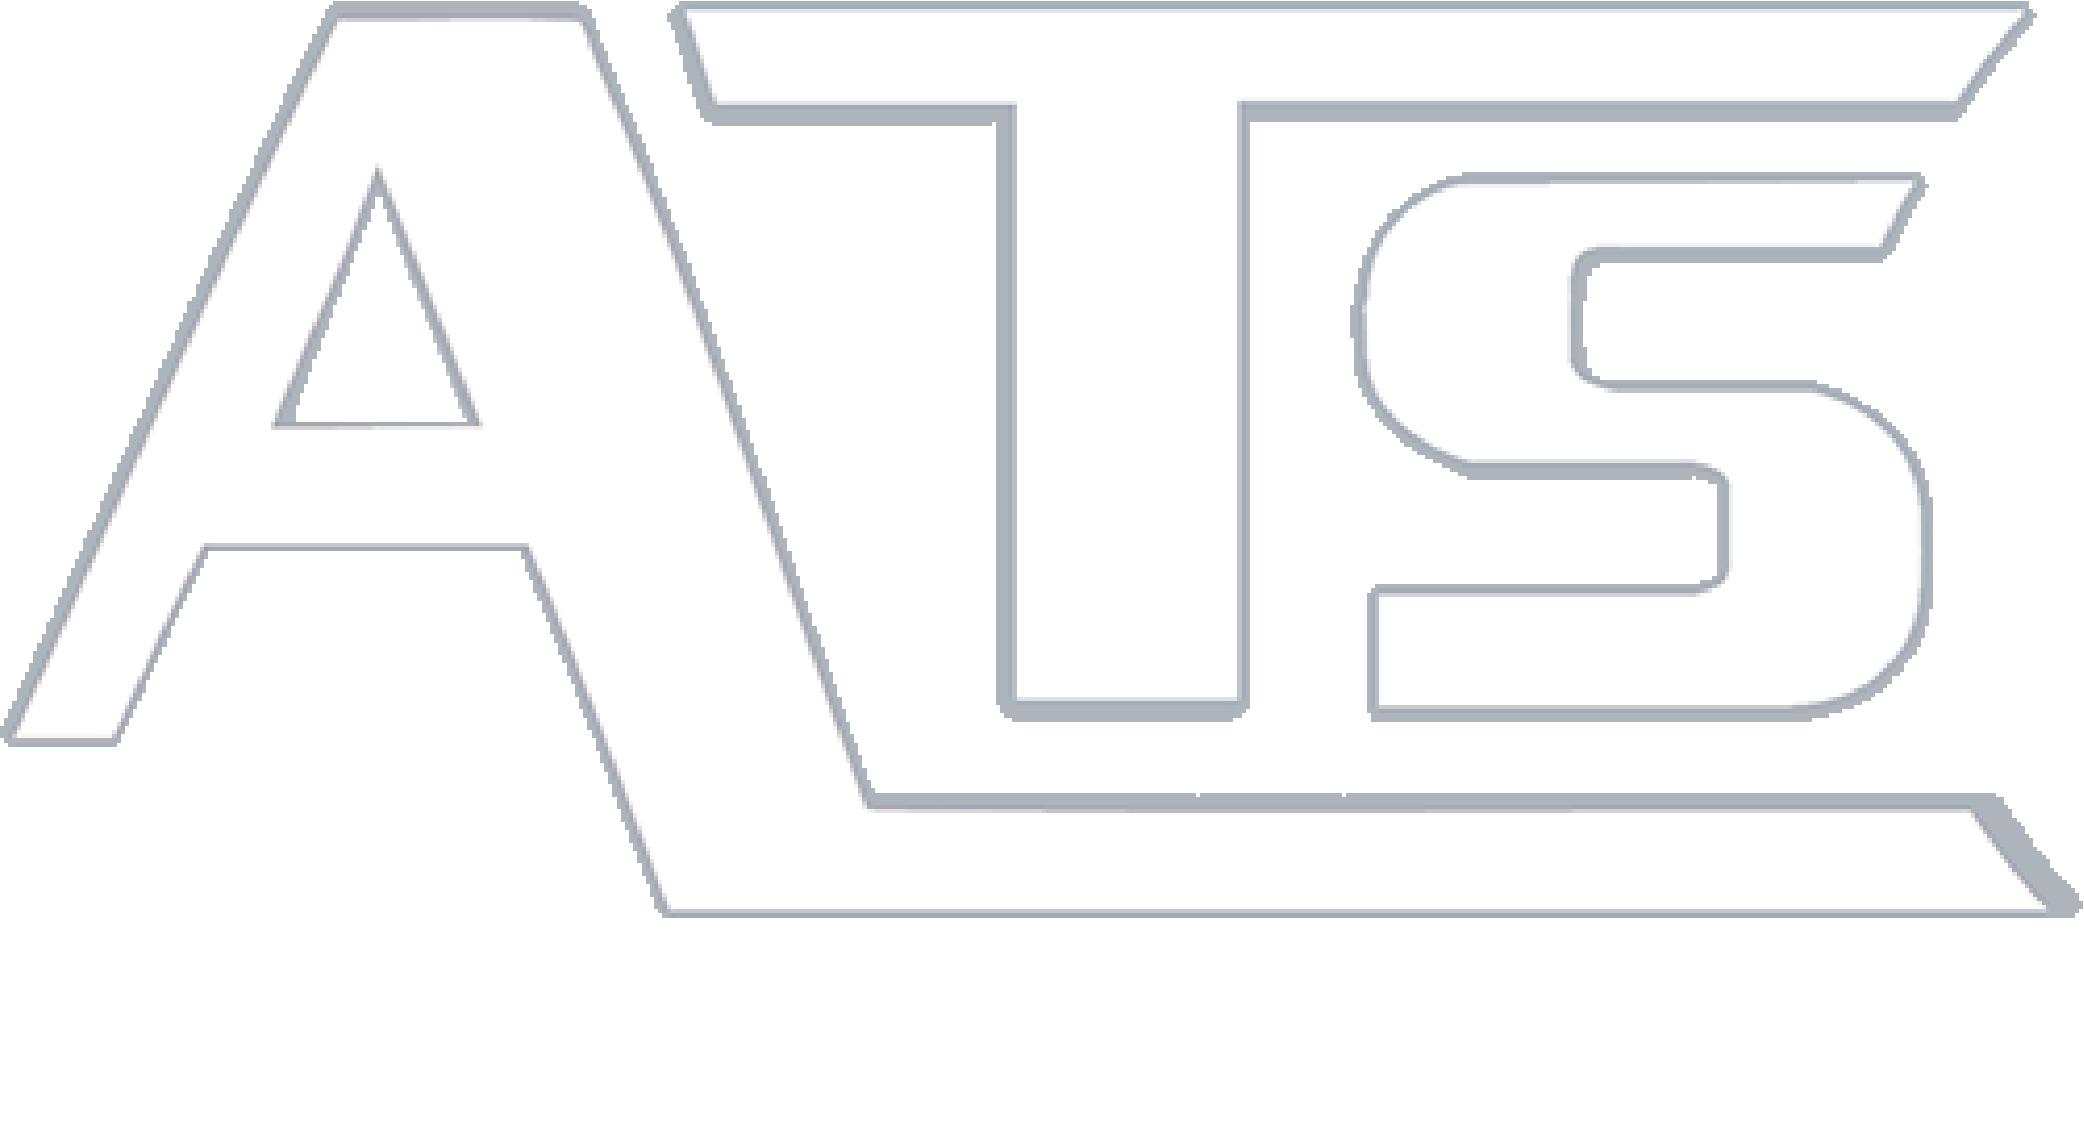 ATS: An AgTac Company